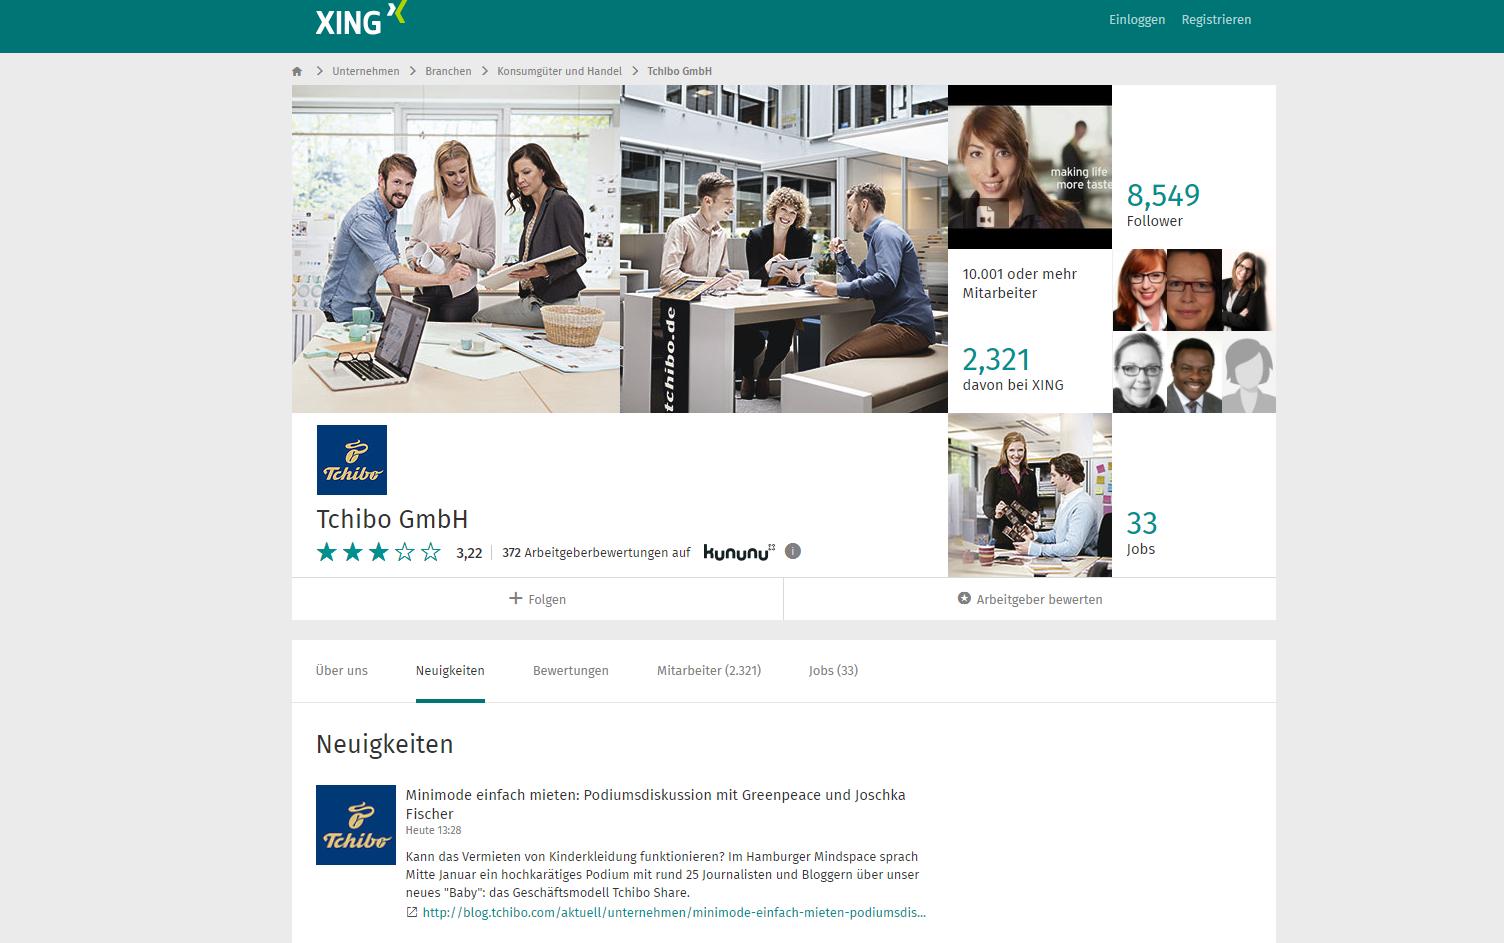 Xing Unternehmensprofil Tchibo